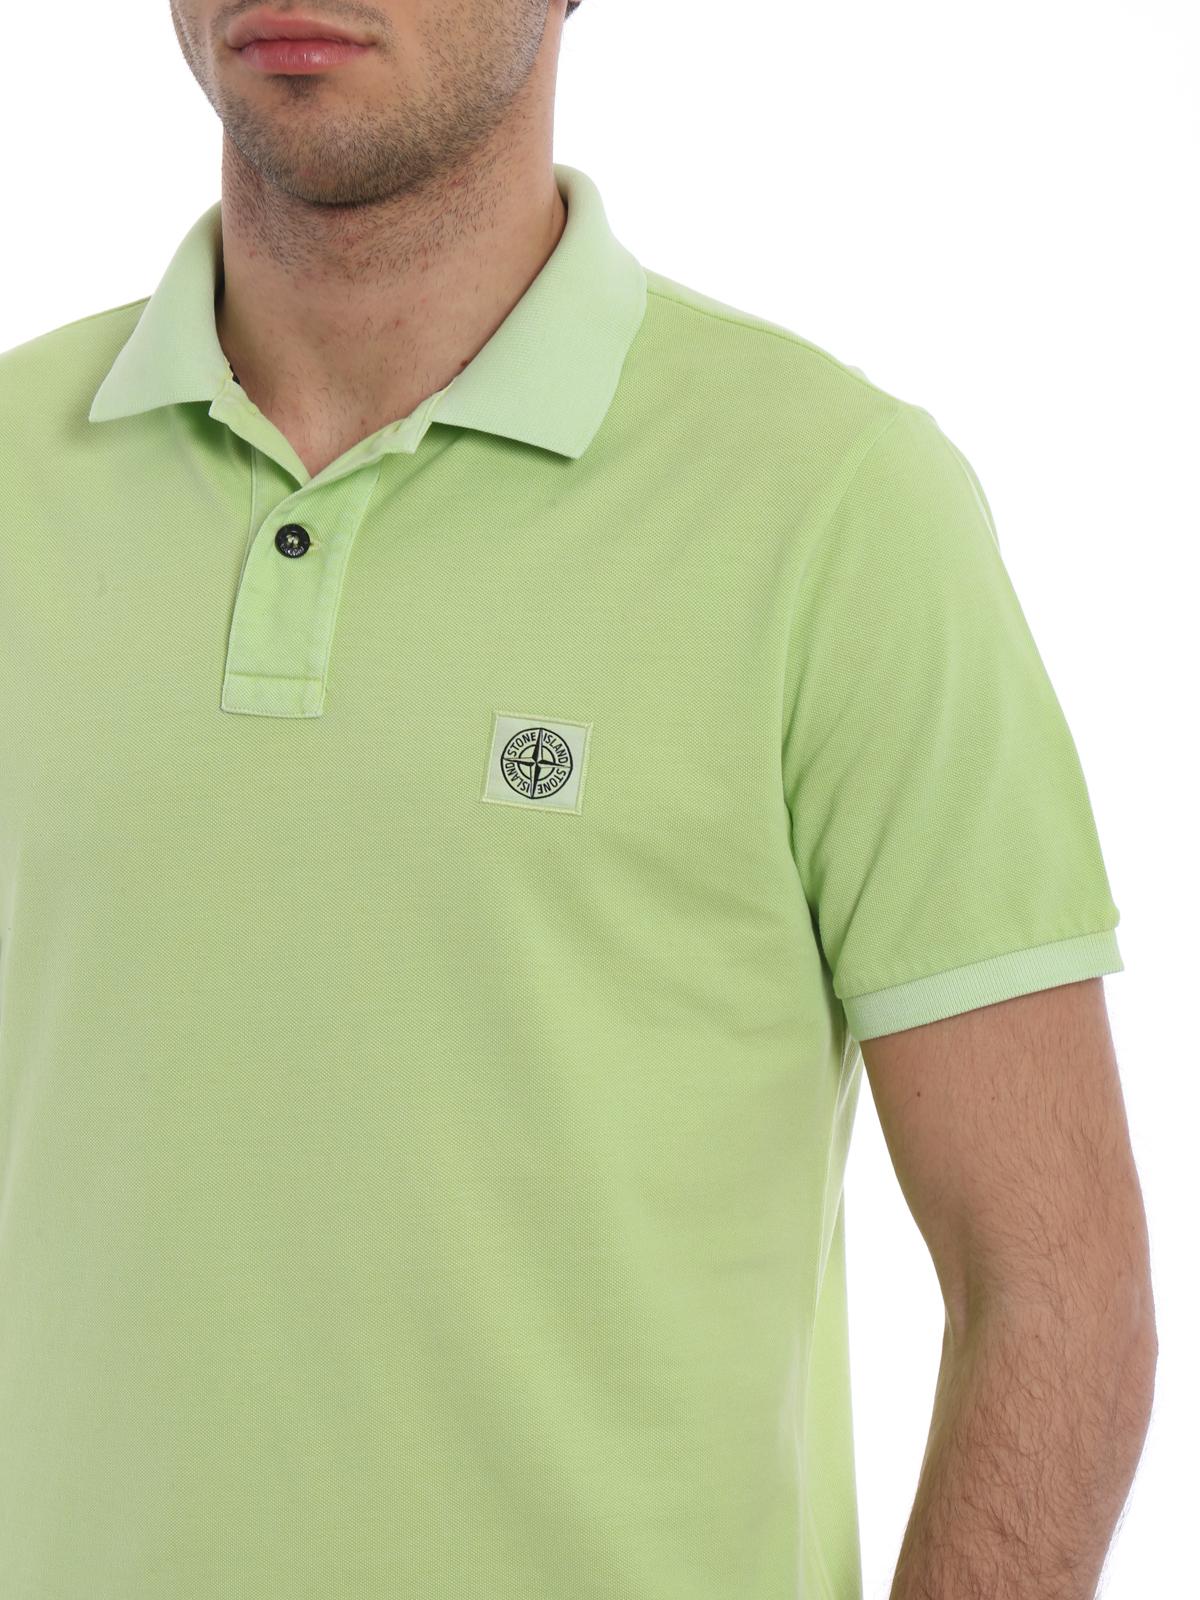 Stone Island Light Green Slim Fit Polo Shirt Polo Shirts